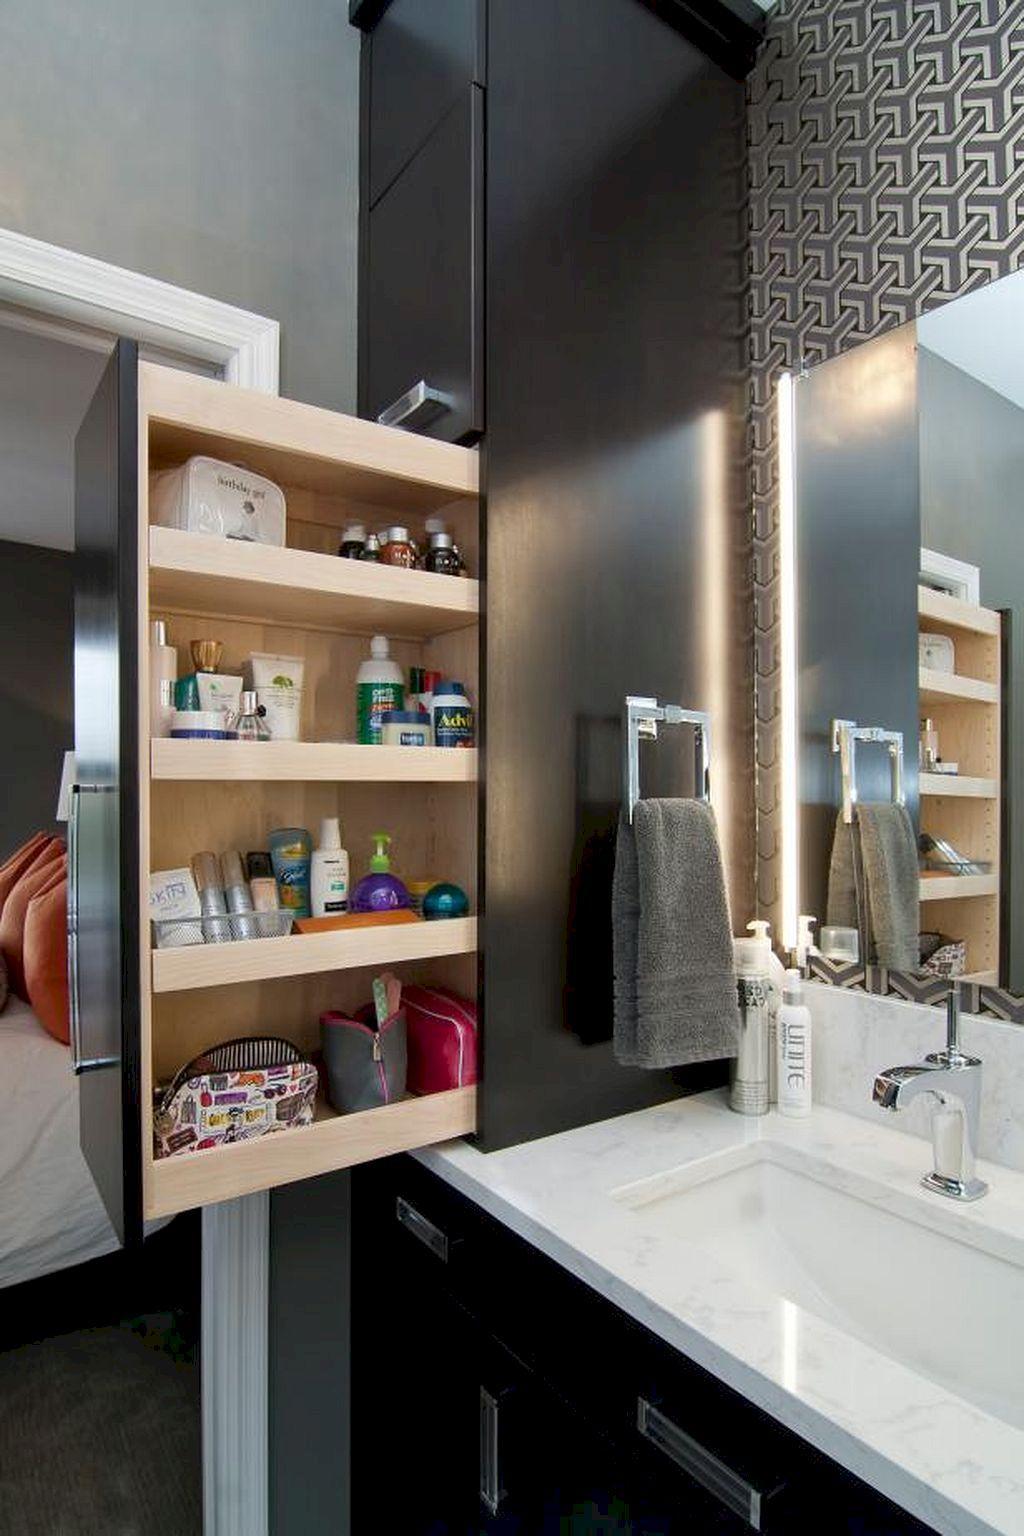 75 Efficient Small Bathroom Remodel Design Ideas   Roomaniac.com